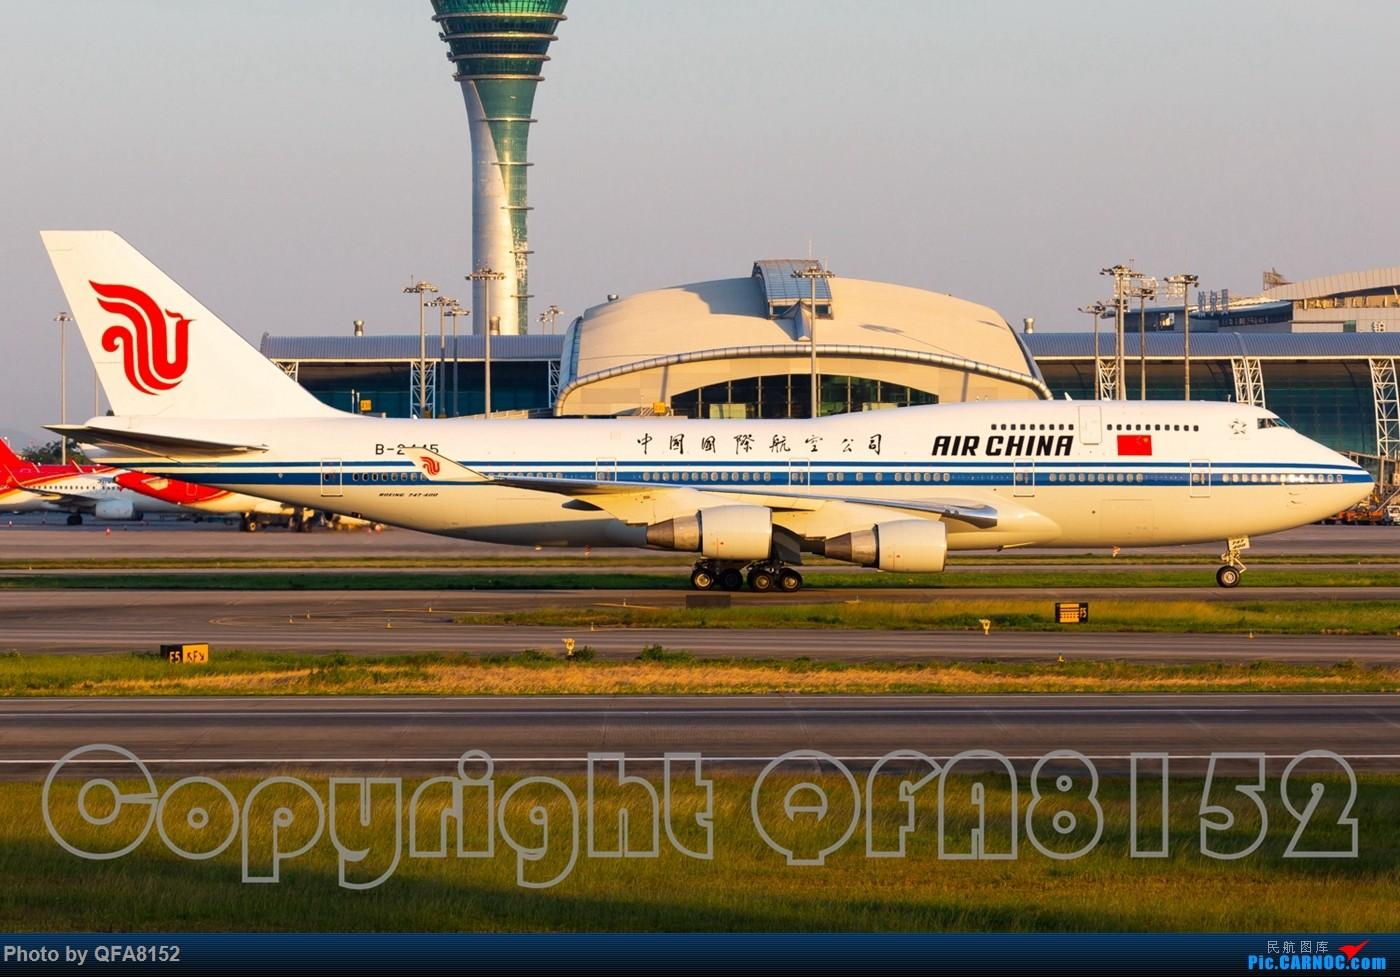 Re:[原创]现在发图好像有钱拿了? BOEING 747-400 B-2445 中国广州白云国际机场